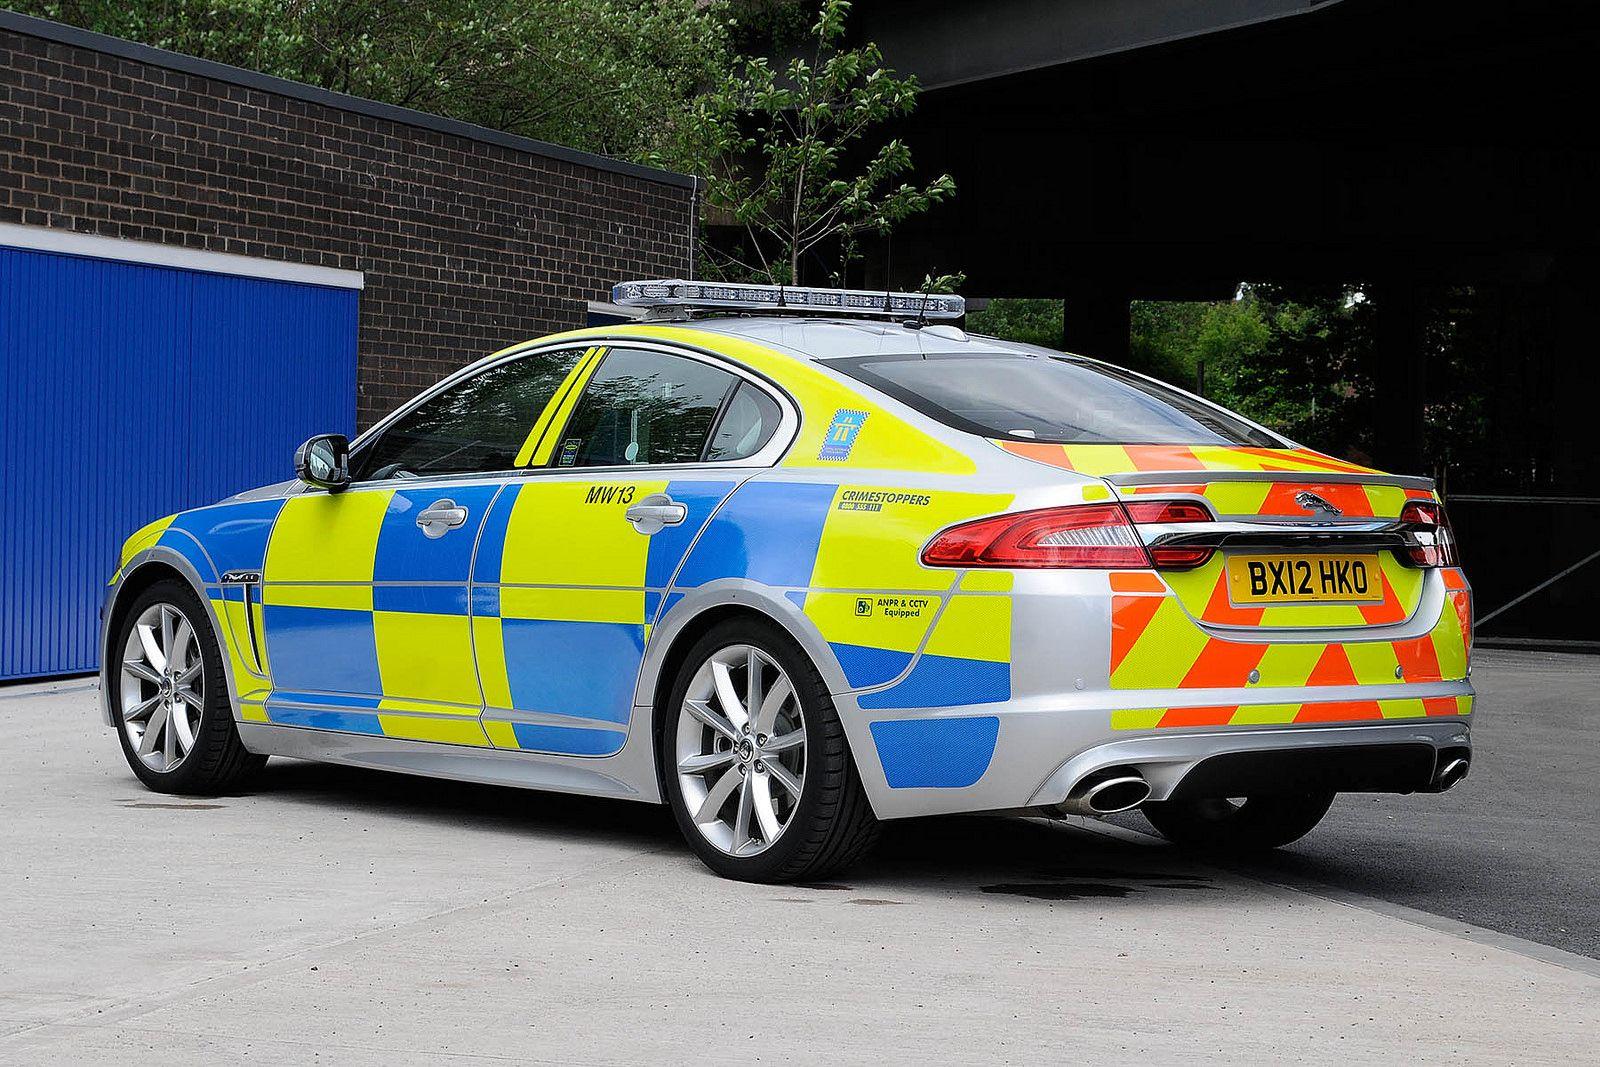 Bx12 hko 02 police cars rescue vehicles british police